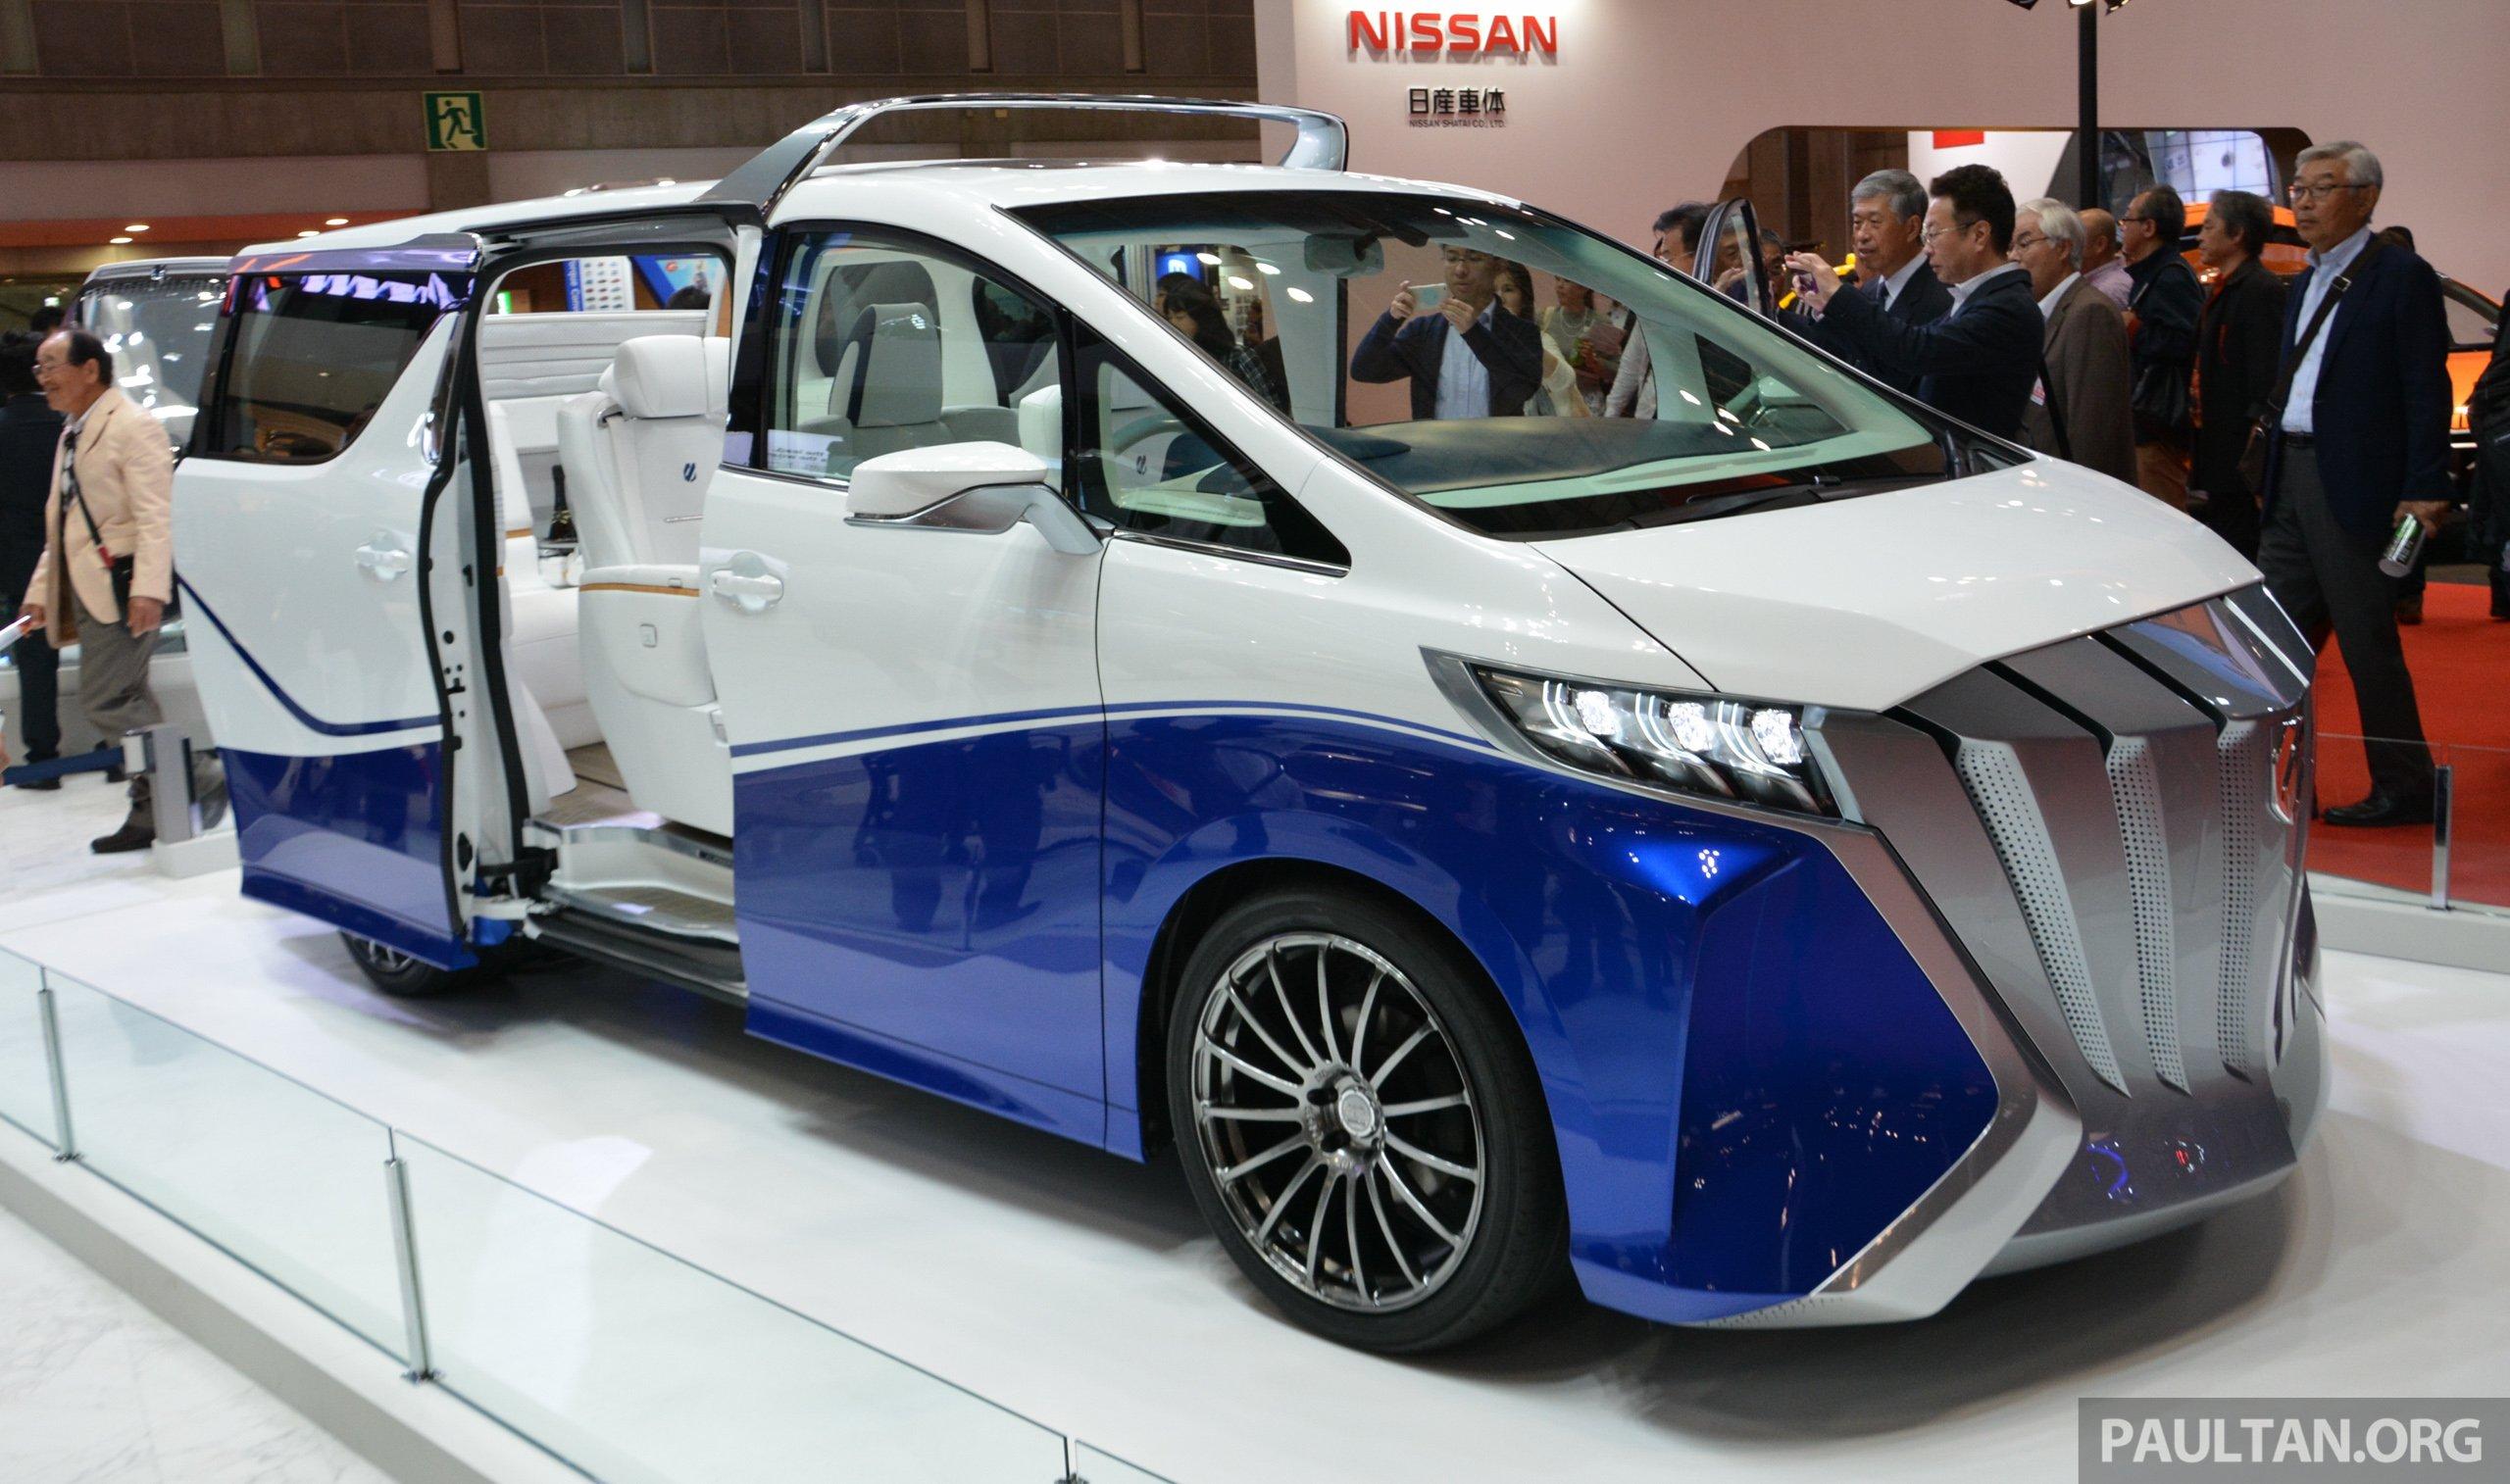 Tokyo 2015: Toyota Auto Body Alphard Hercule debuts Image 399820